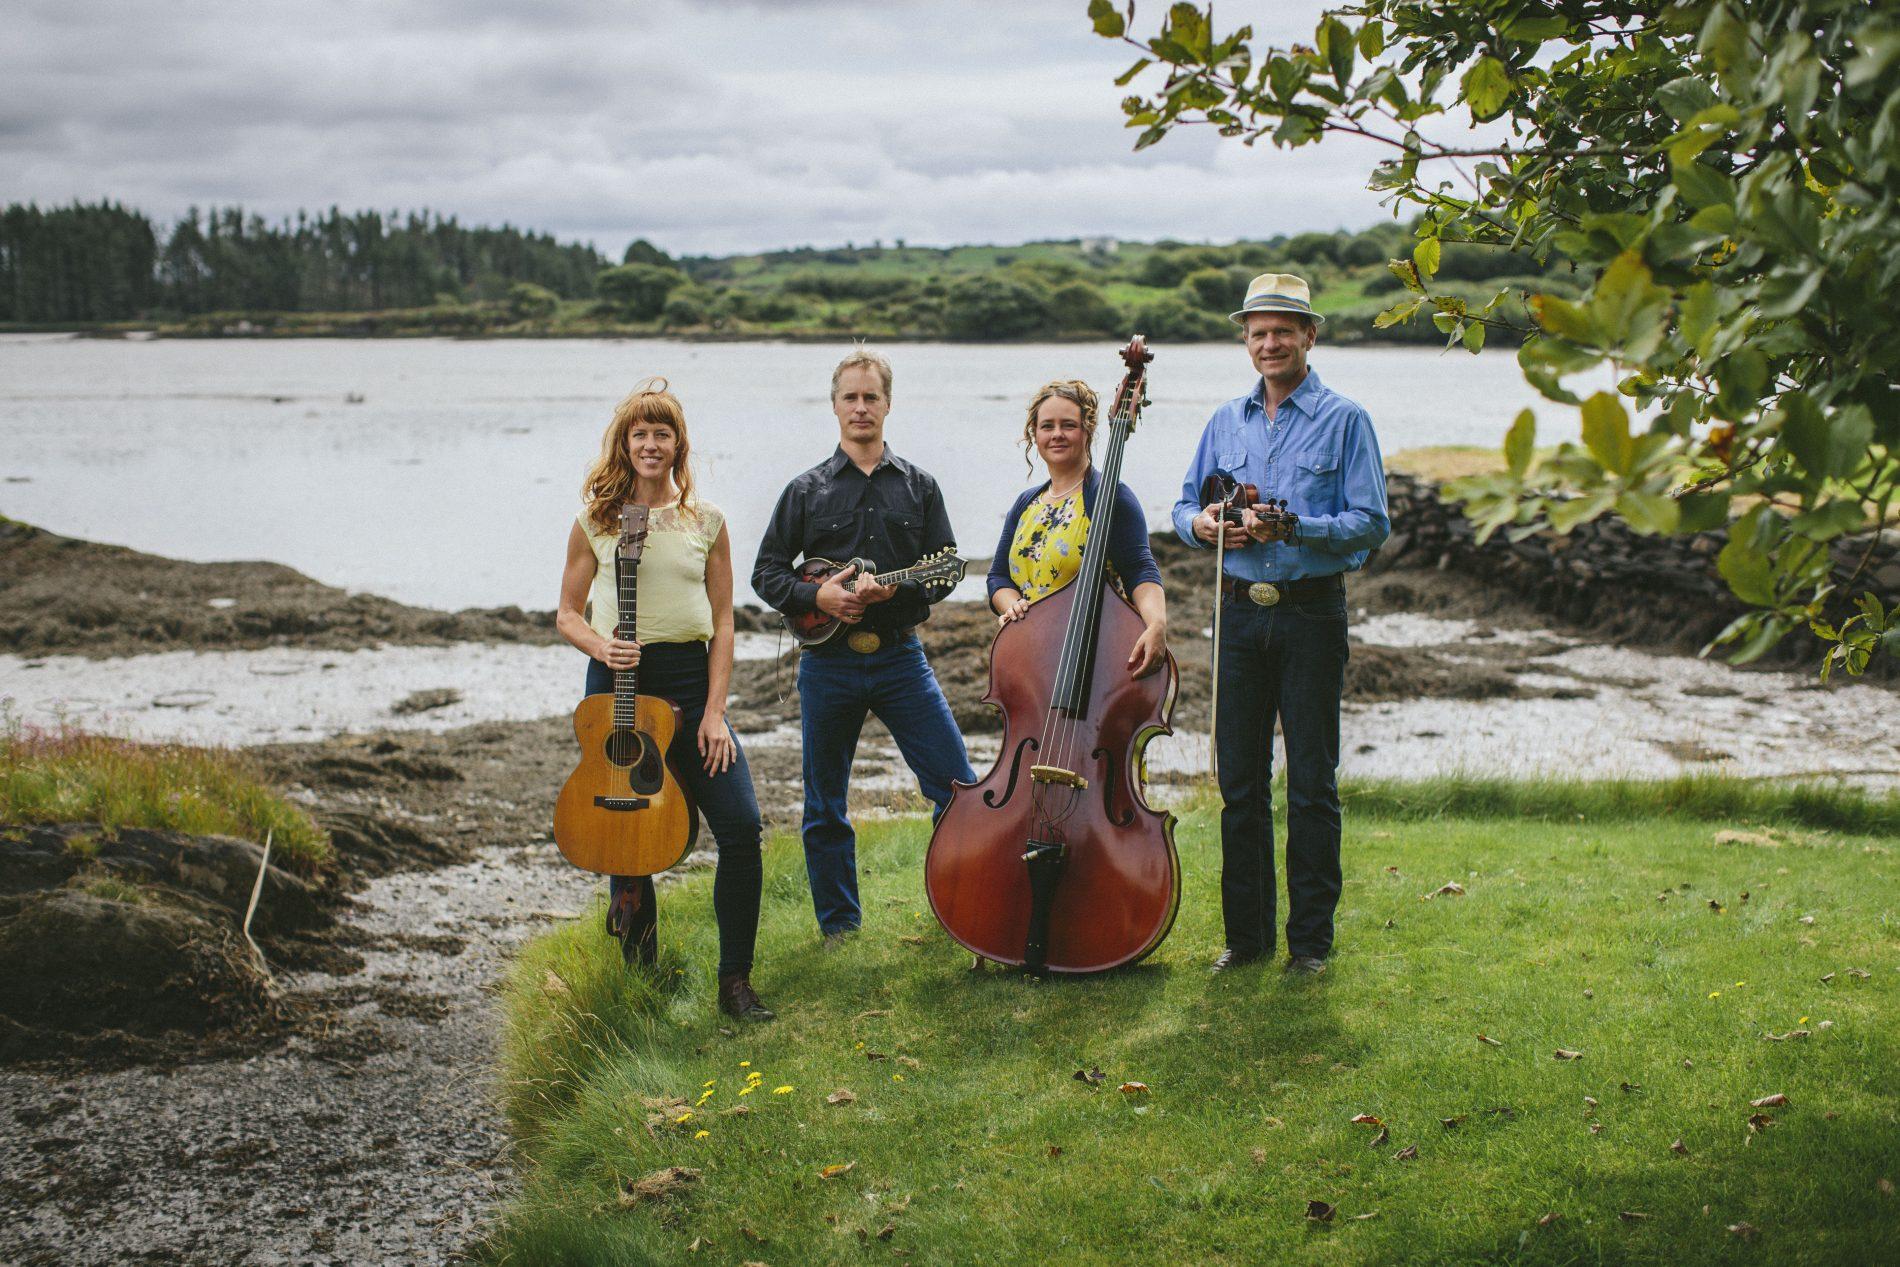 WATCH: Foghorn Stringband, 'Reuben's Train'